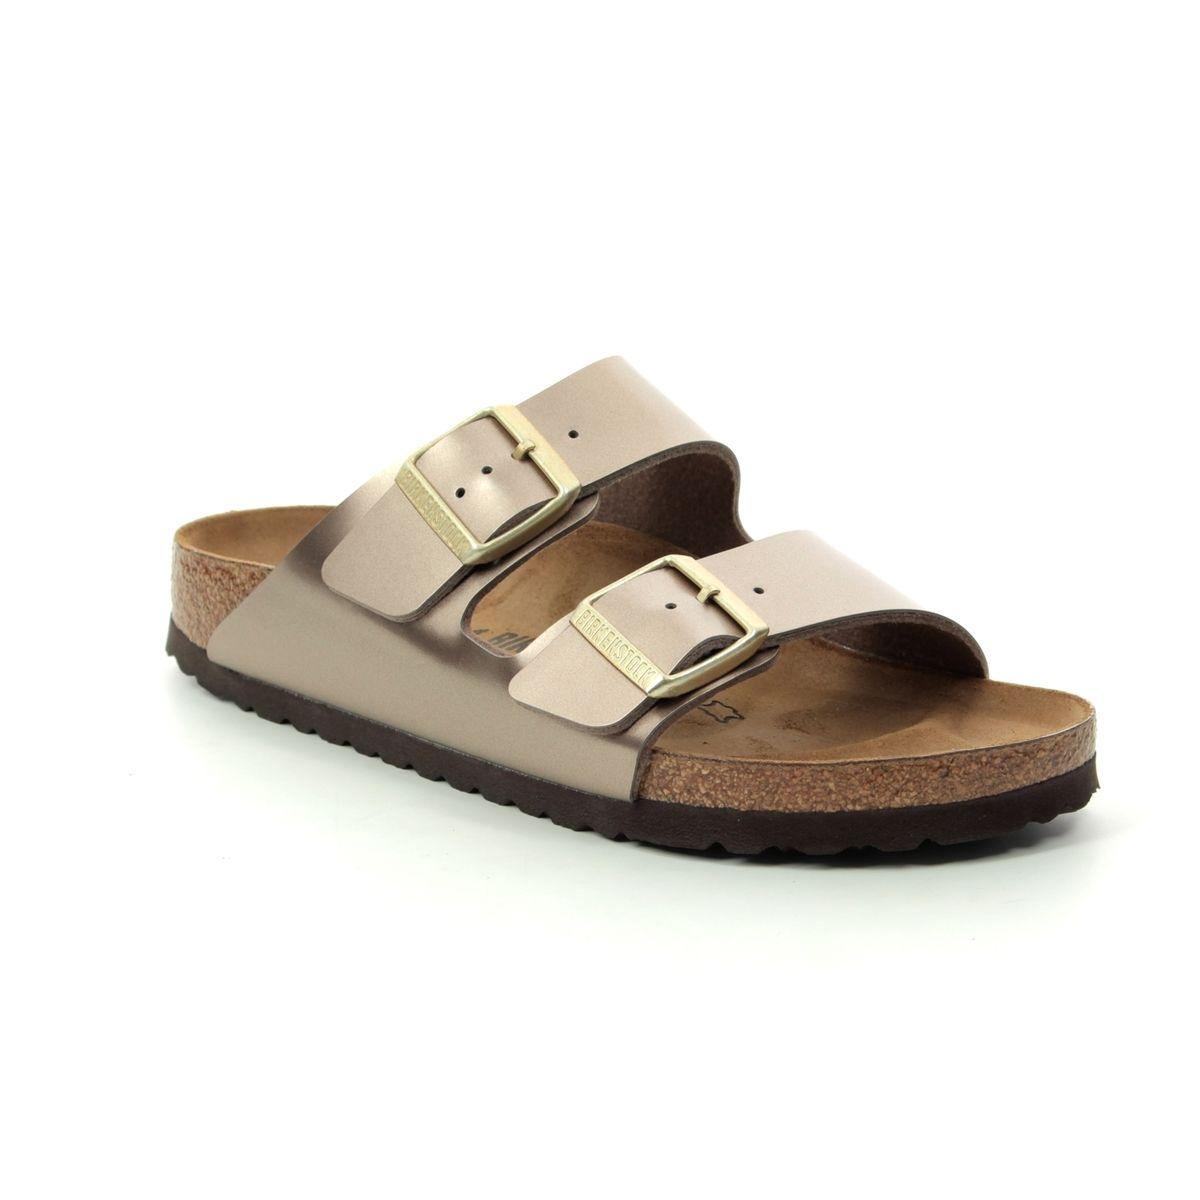 1955f06e2685e Birkenstock Slide Sandals - Metallic - 1012972 ARIZONA ELECTRIC METALLIC  TAUPE NARROW FIT